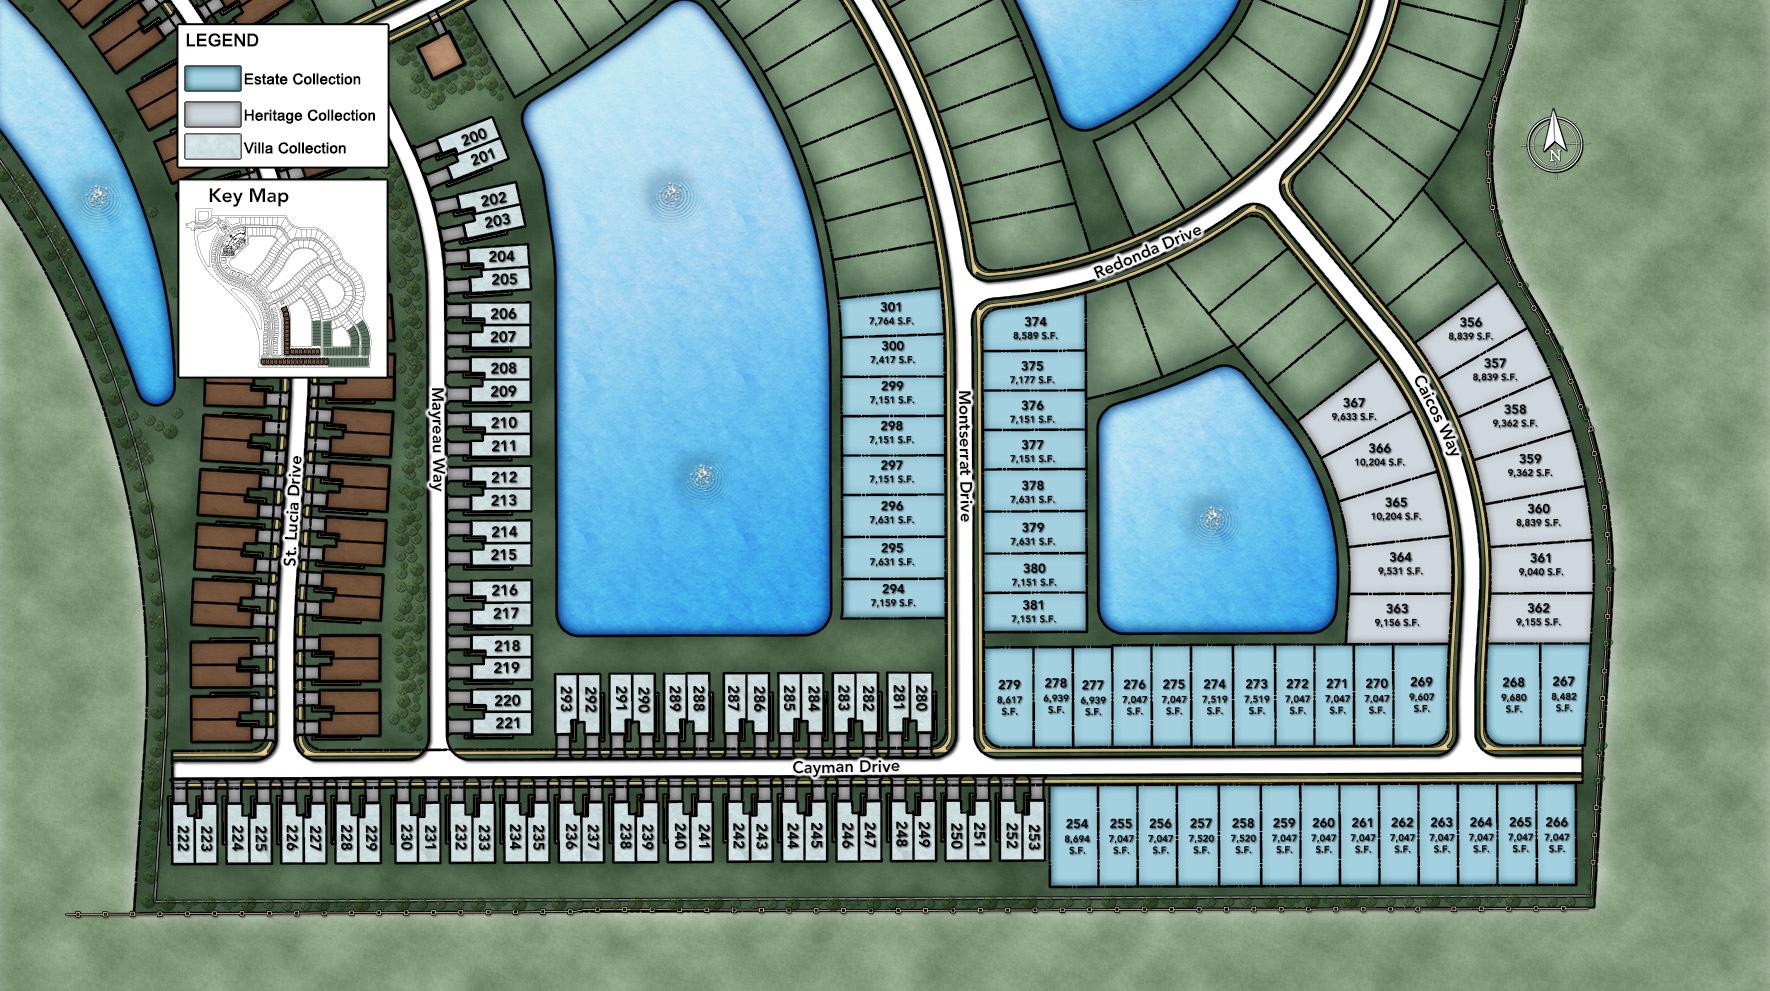 Azure at Hacienda Lakes - Heritage Collection Site Plan III